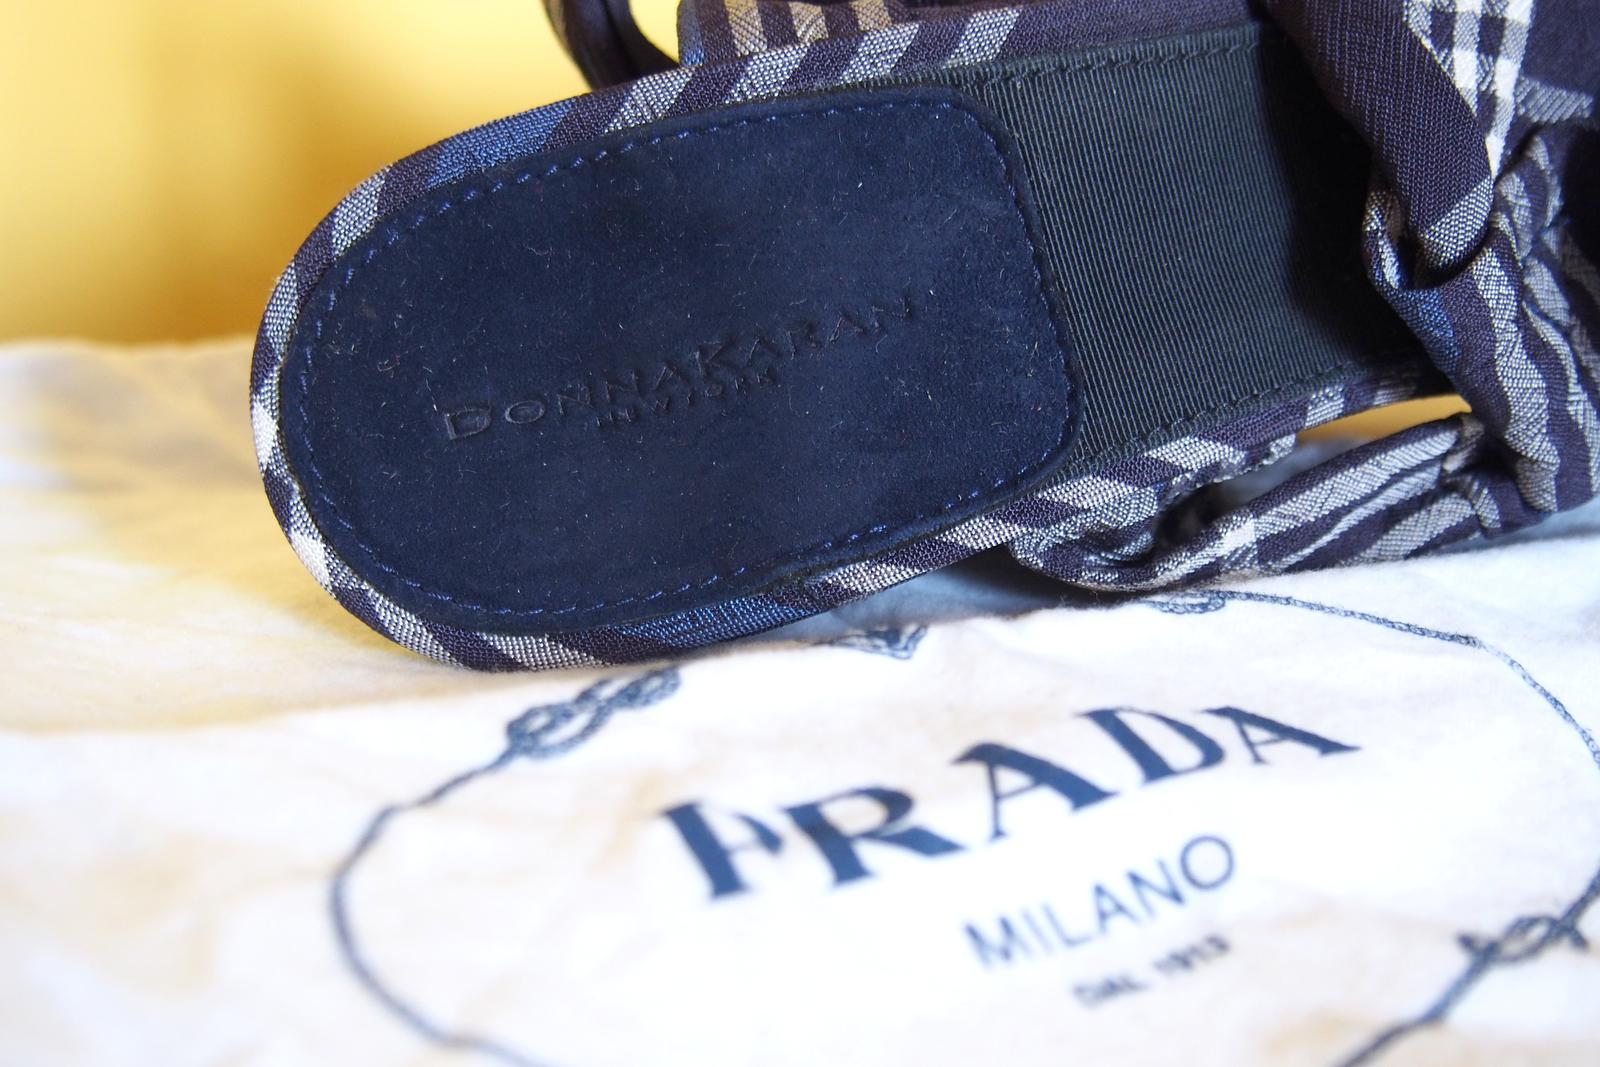 Donna Karan DKNY sandálky na platforme - Obrázok č. 4